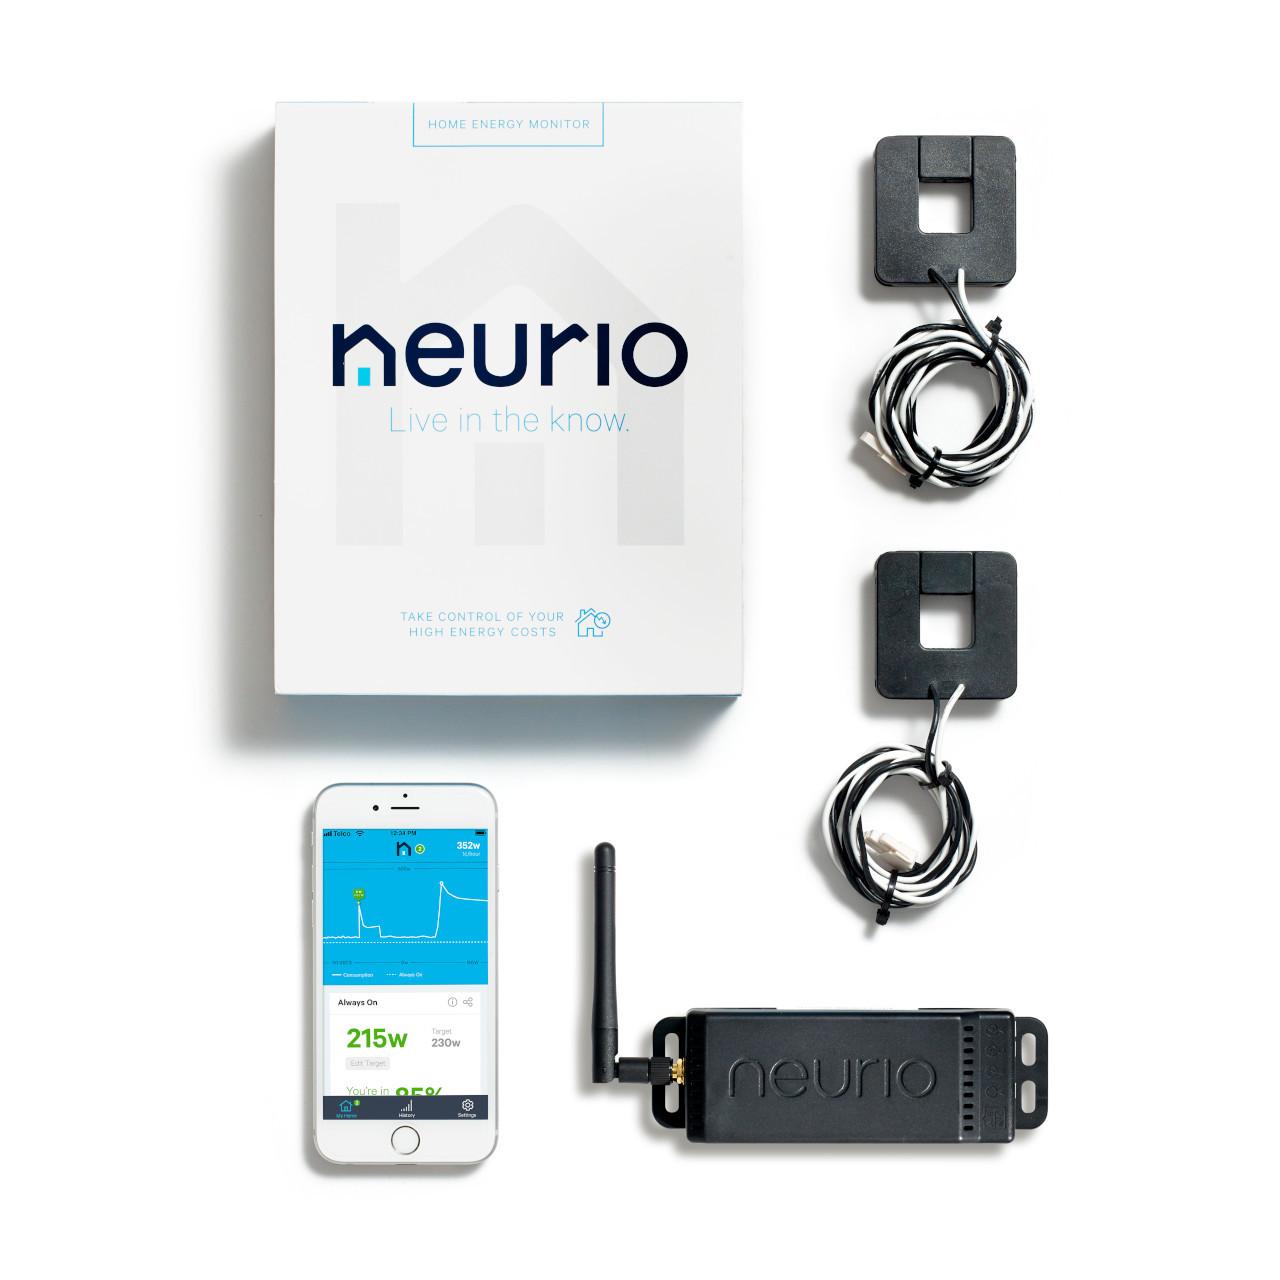 Neurio - W1-HEM Home Energy Monitor